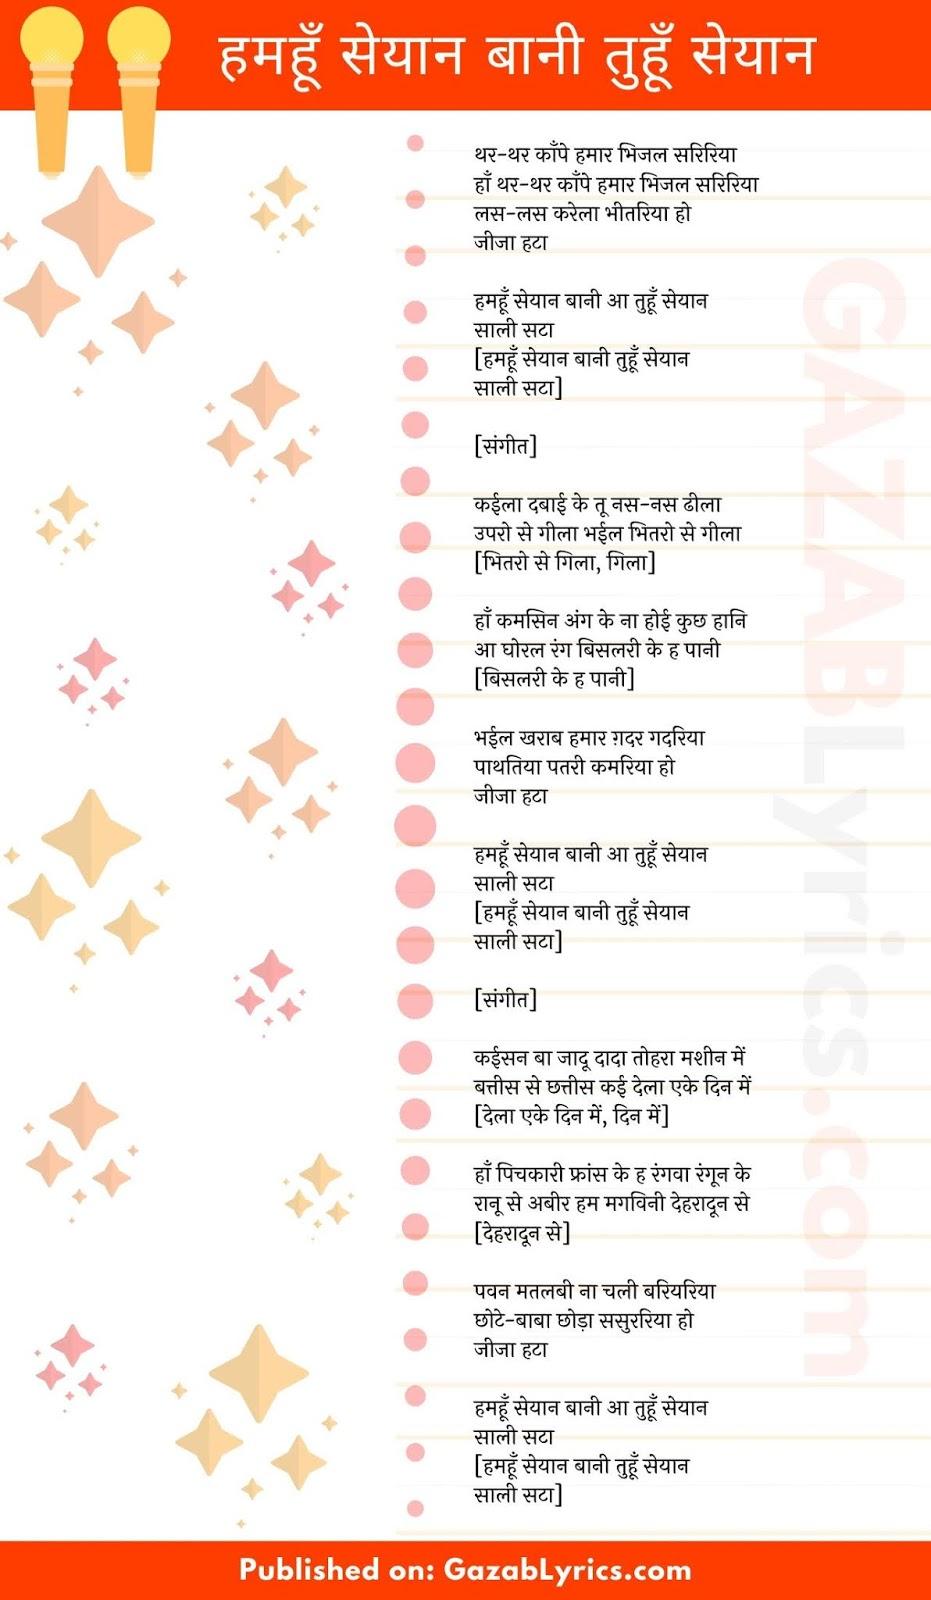 Hamahu Seyan Bani Tuhu Seyan song lyrics image